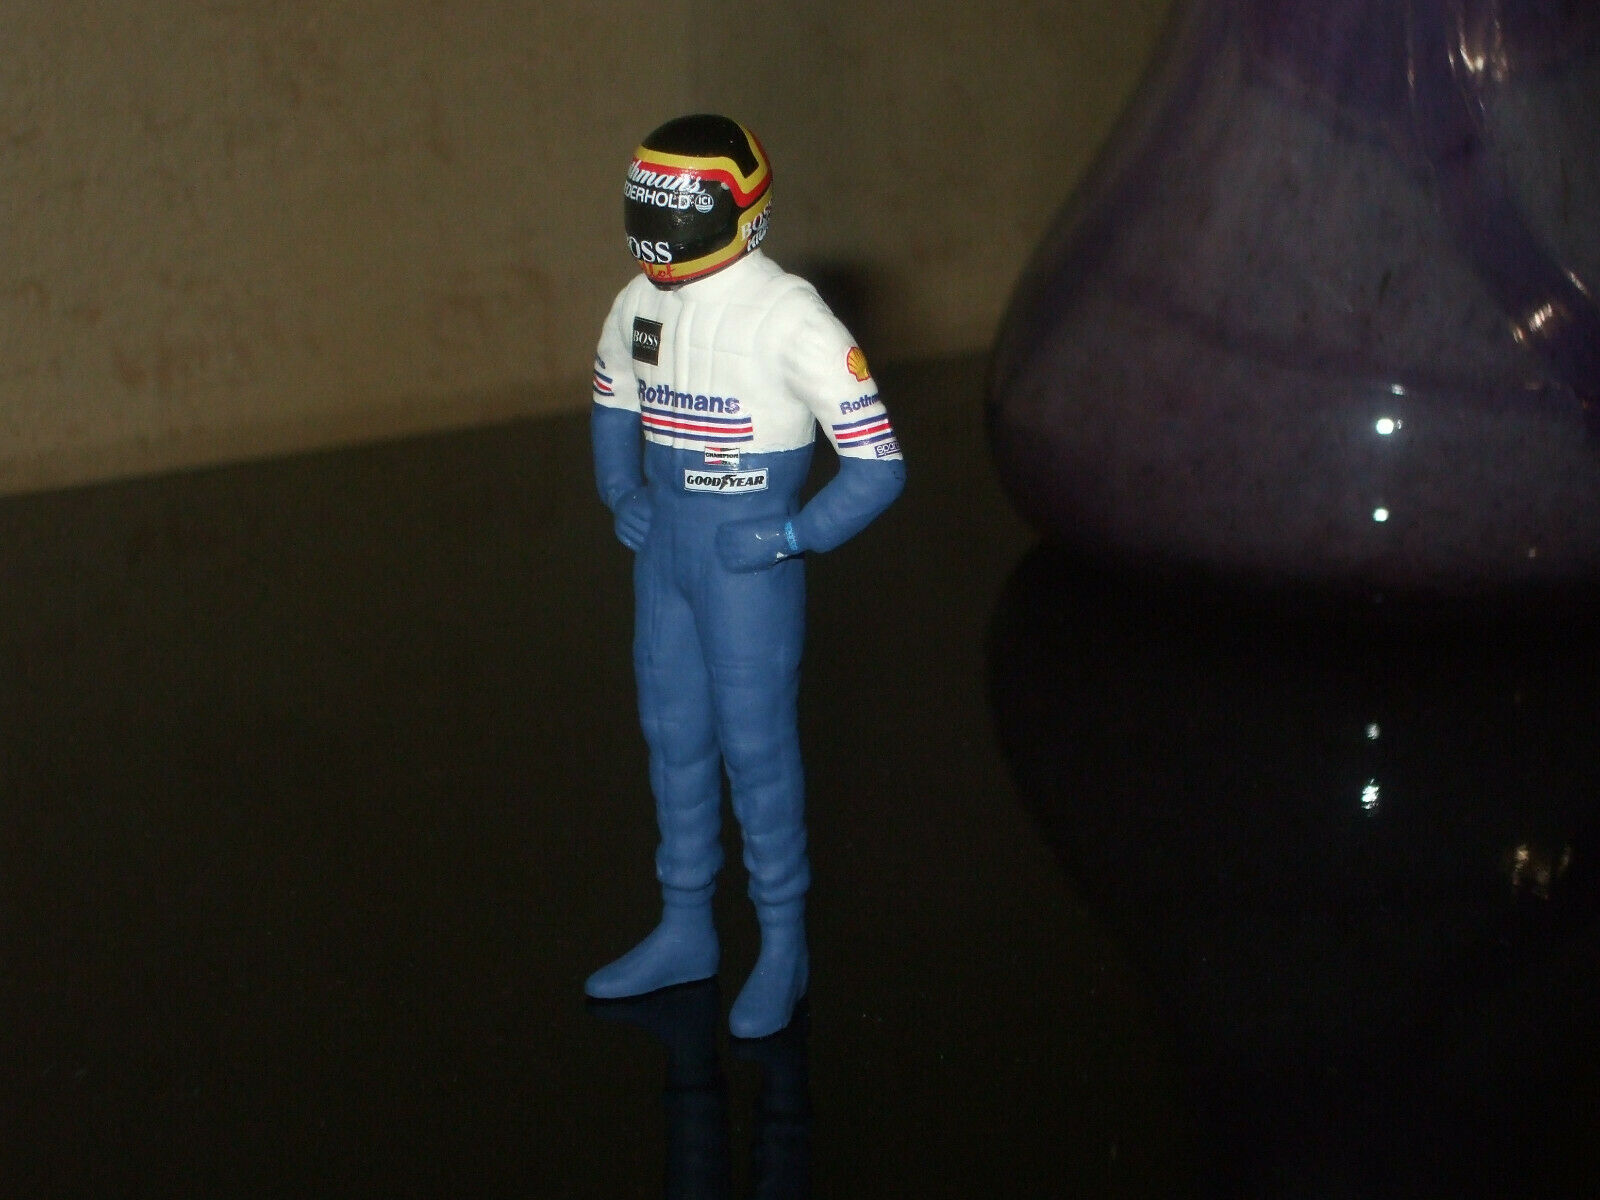 Tyrrell figurine 1 18 f1 s. bellof 1984 formula 1